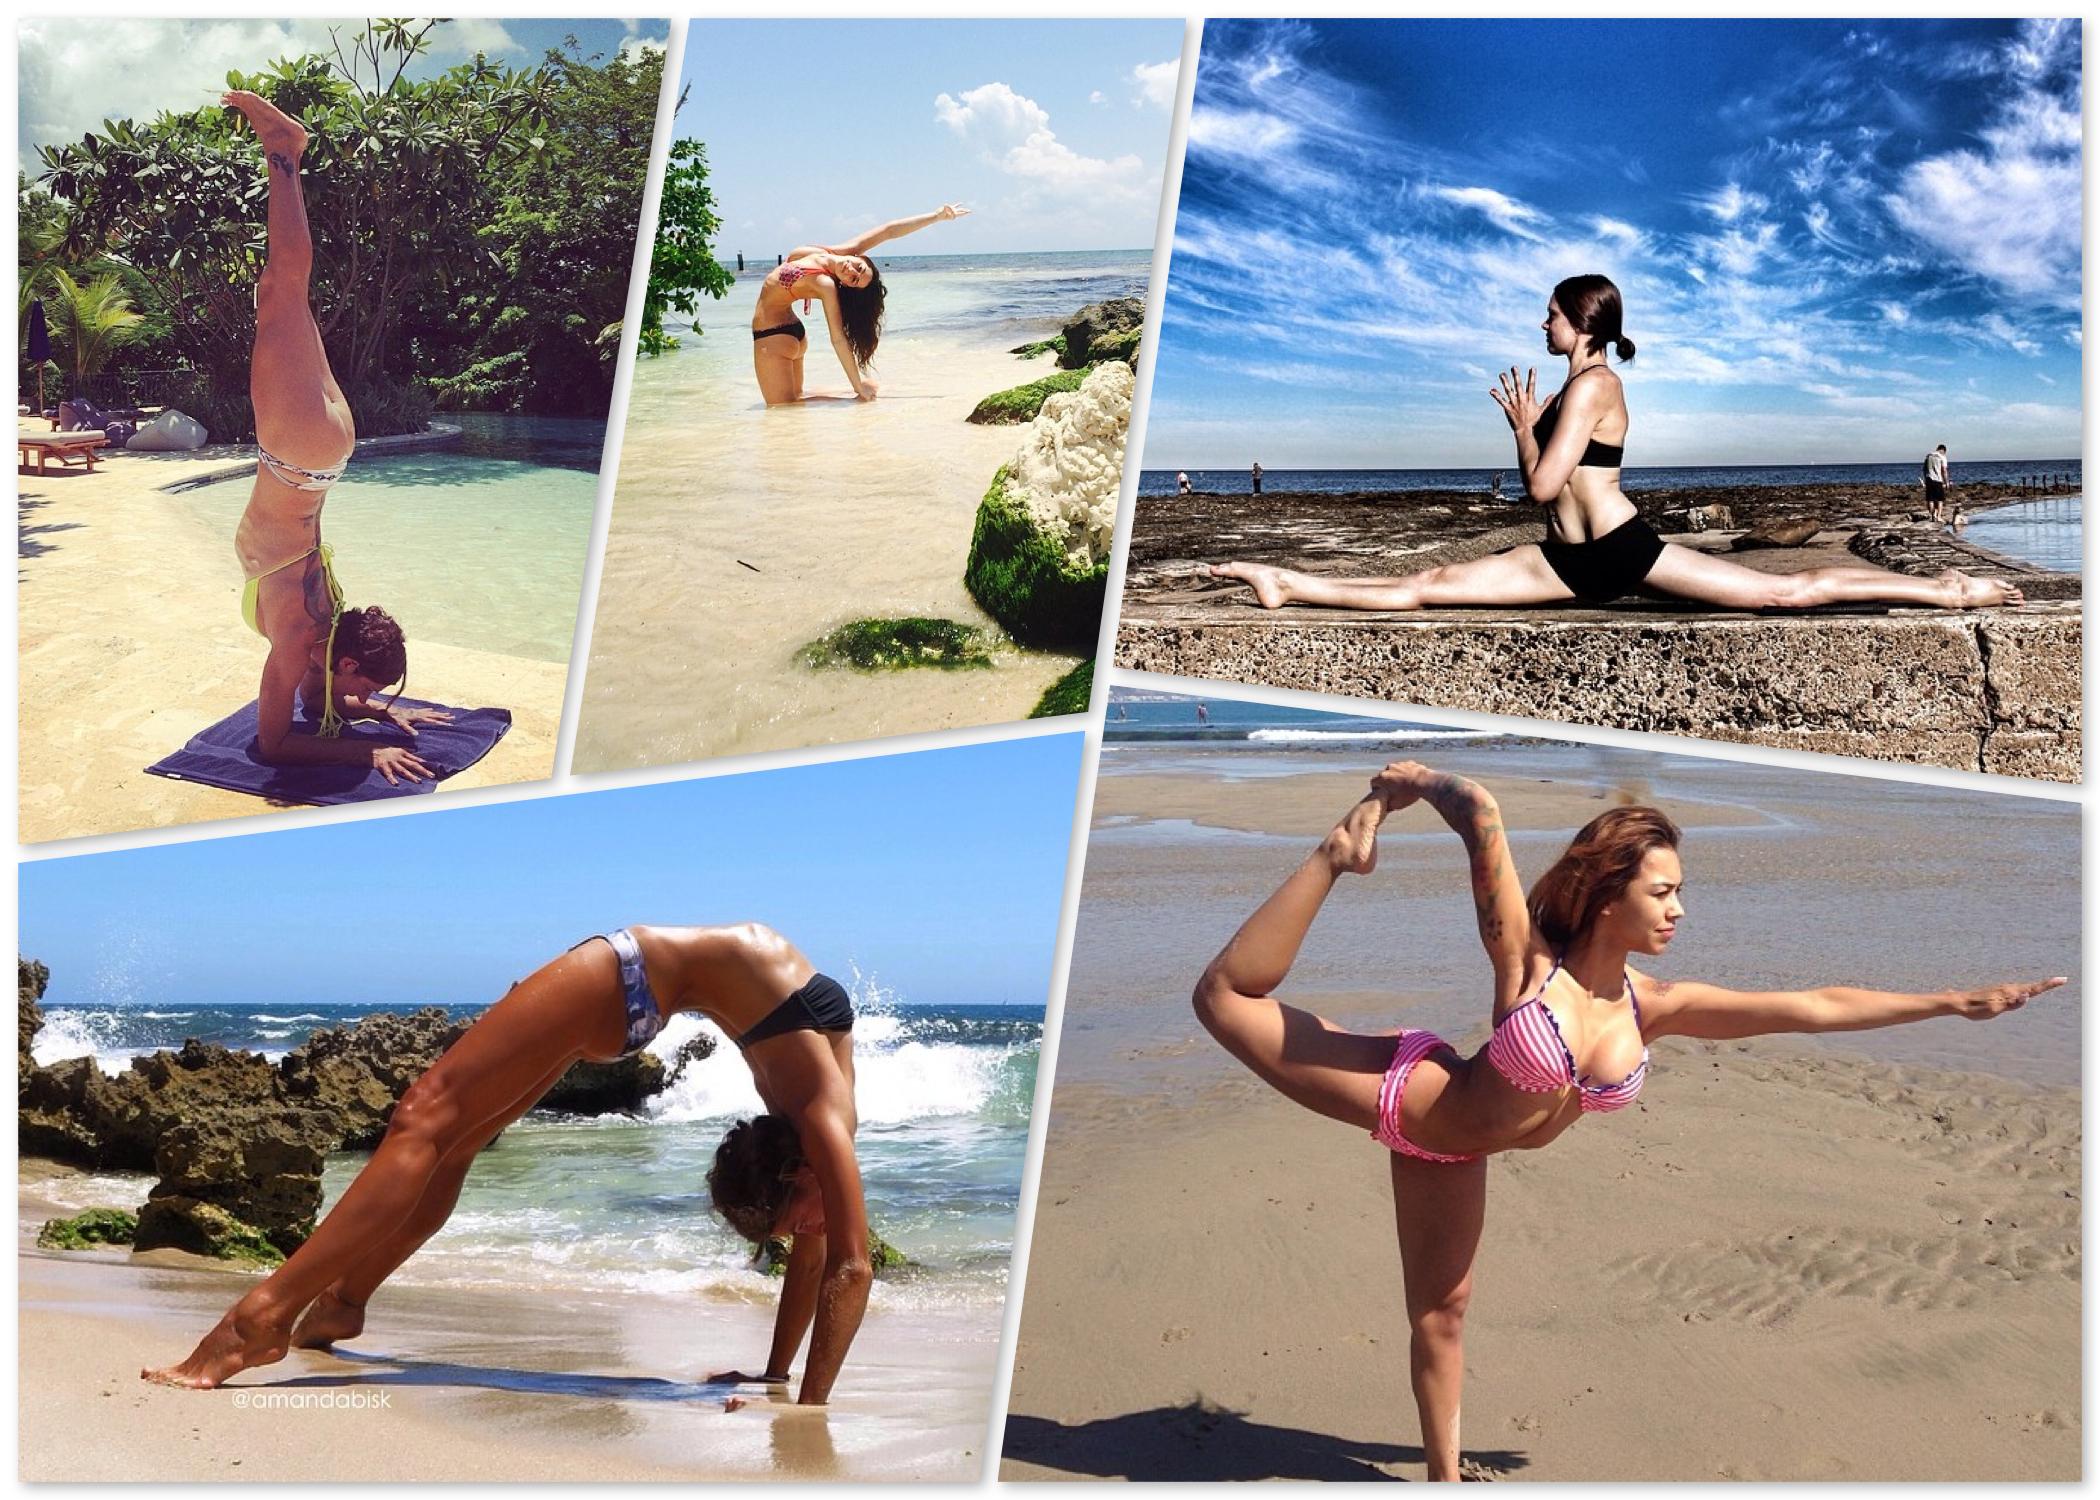 Instagram bikini yogis